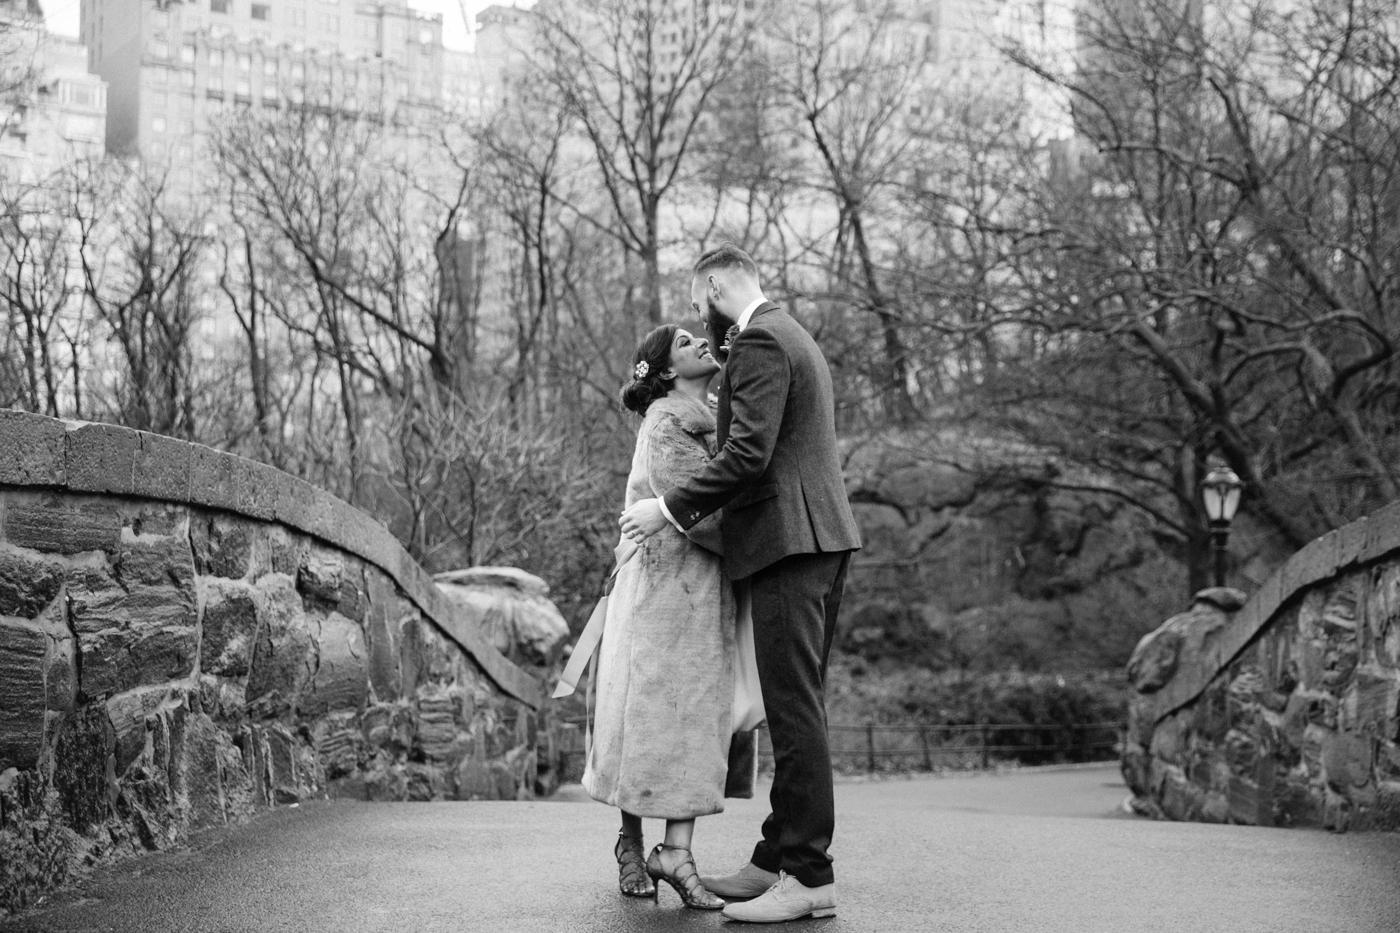 Central-park-wedding-by-Tanya-Isaeva-93.jpg